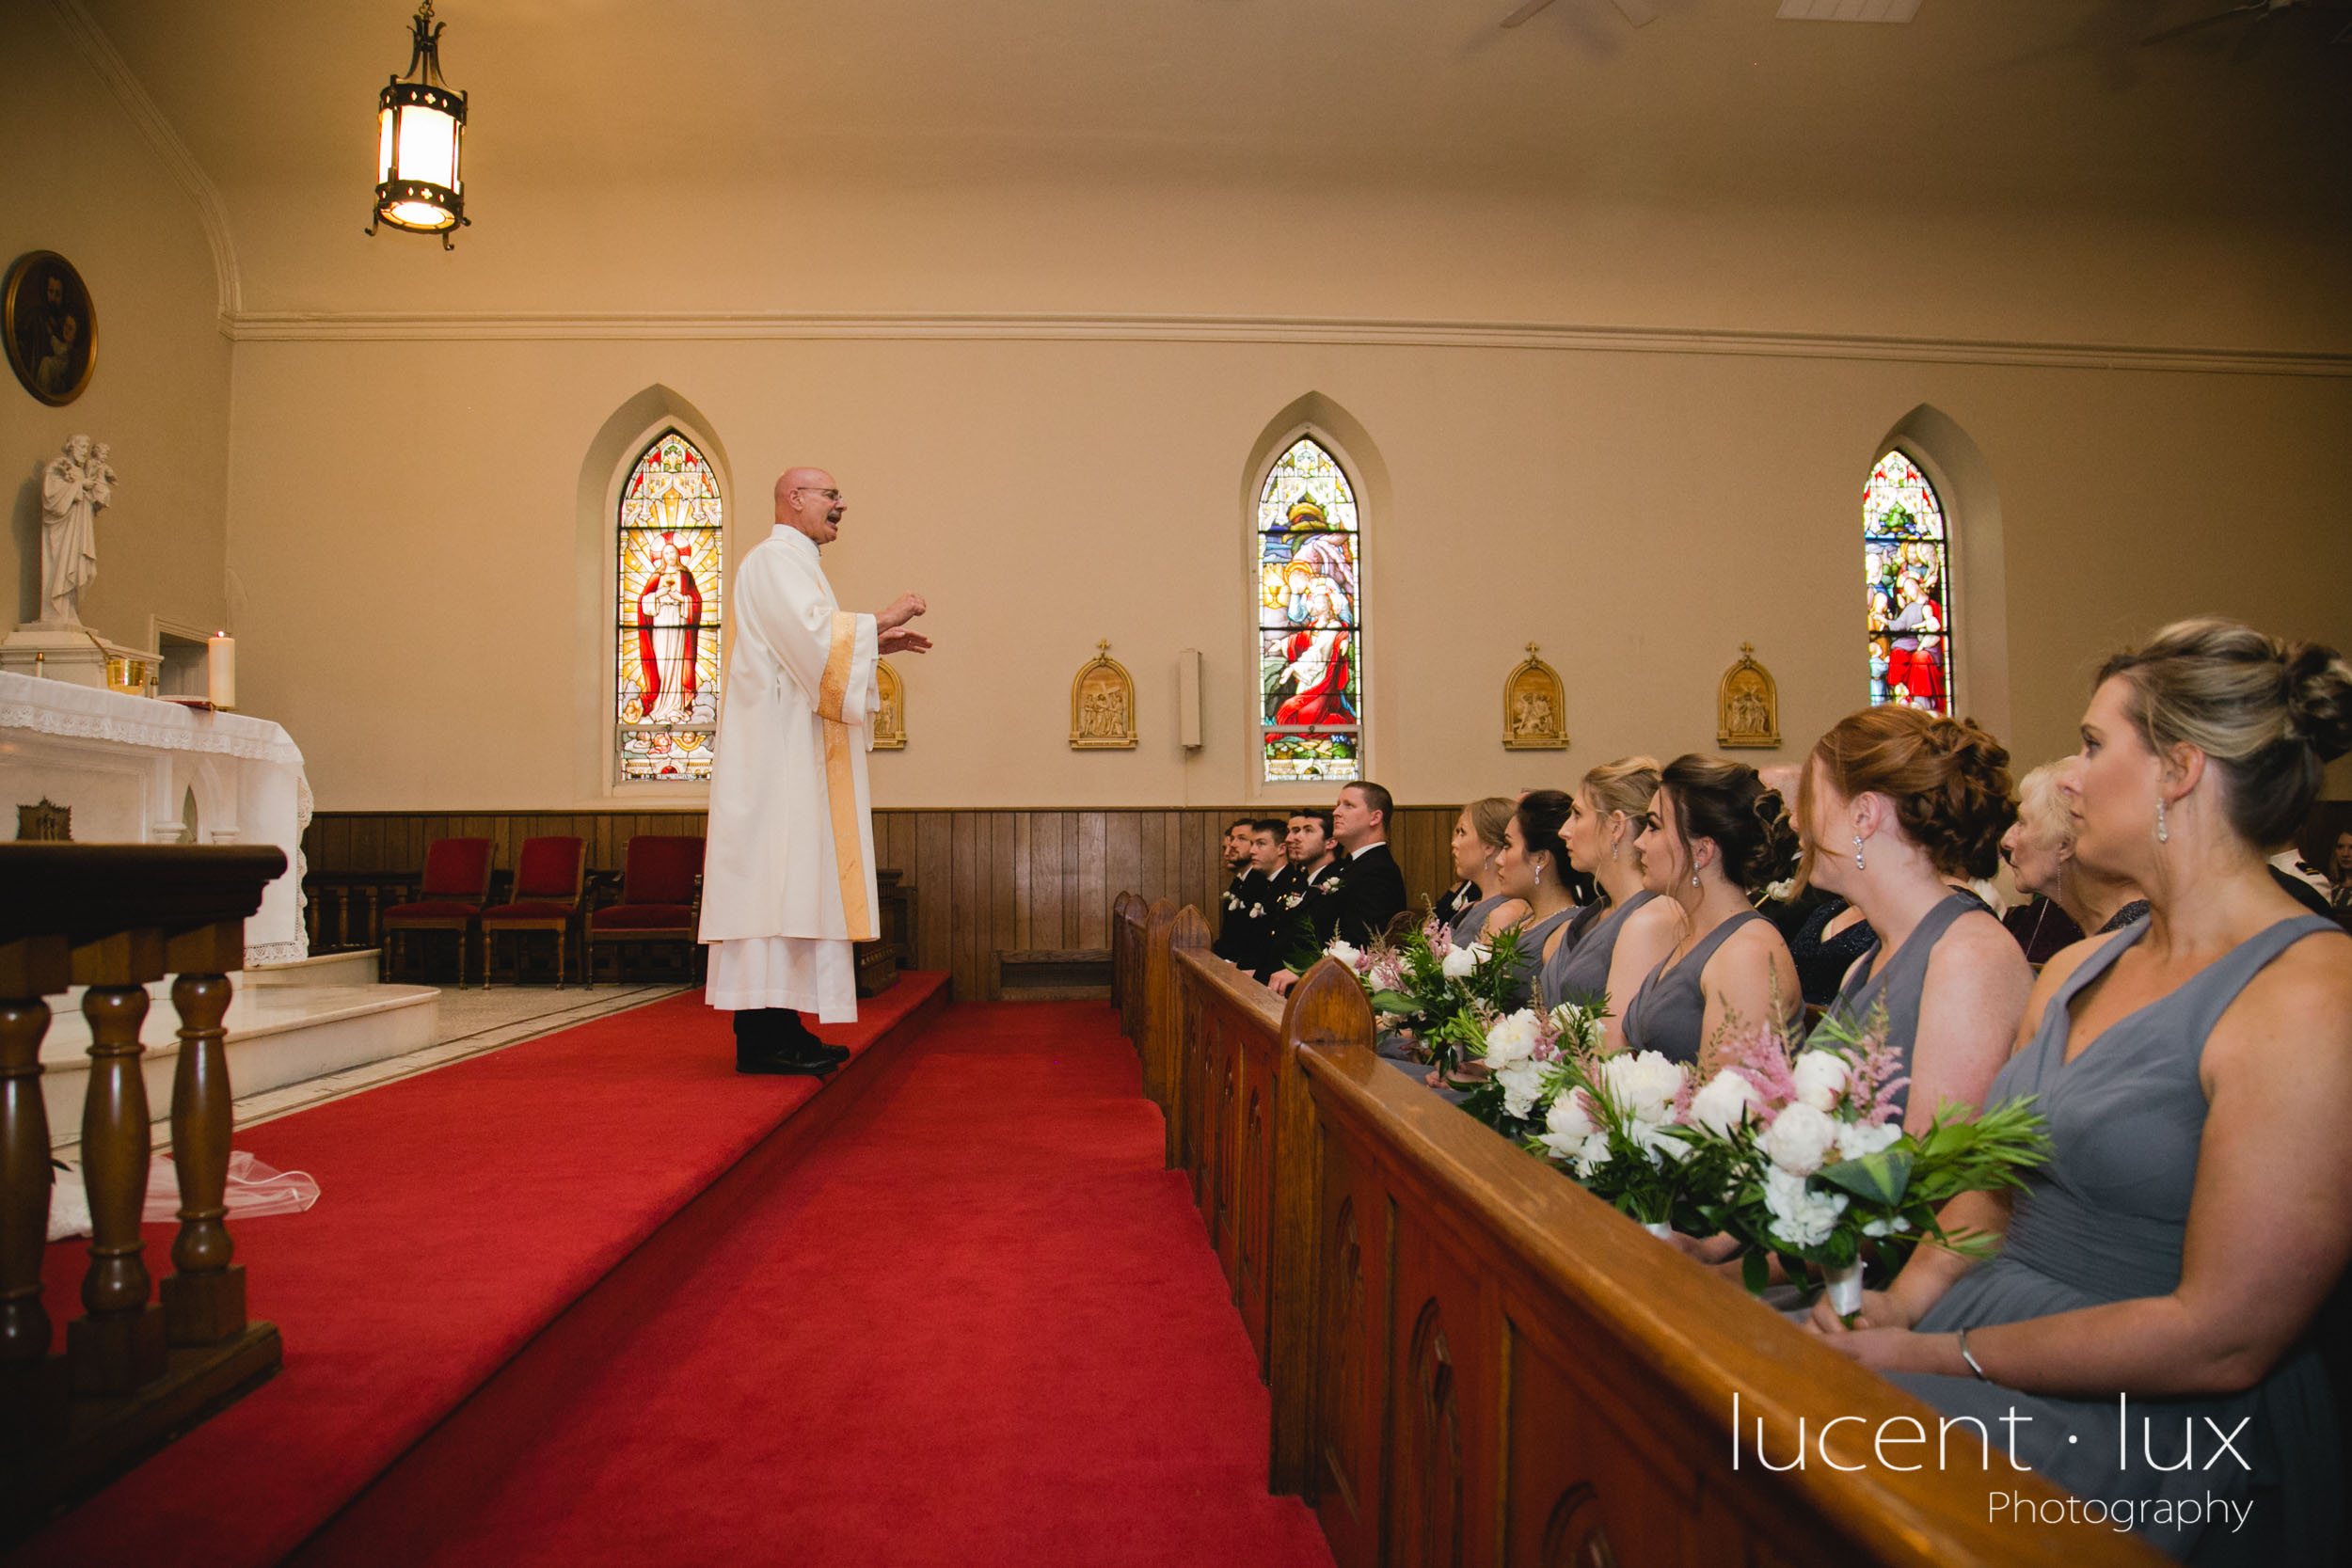 Wedding-Photography-Maryland-Pennsylvania-Photographer-Mendenhall-Inn-Media-Portrait-Event-119.jpg